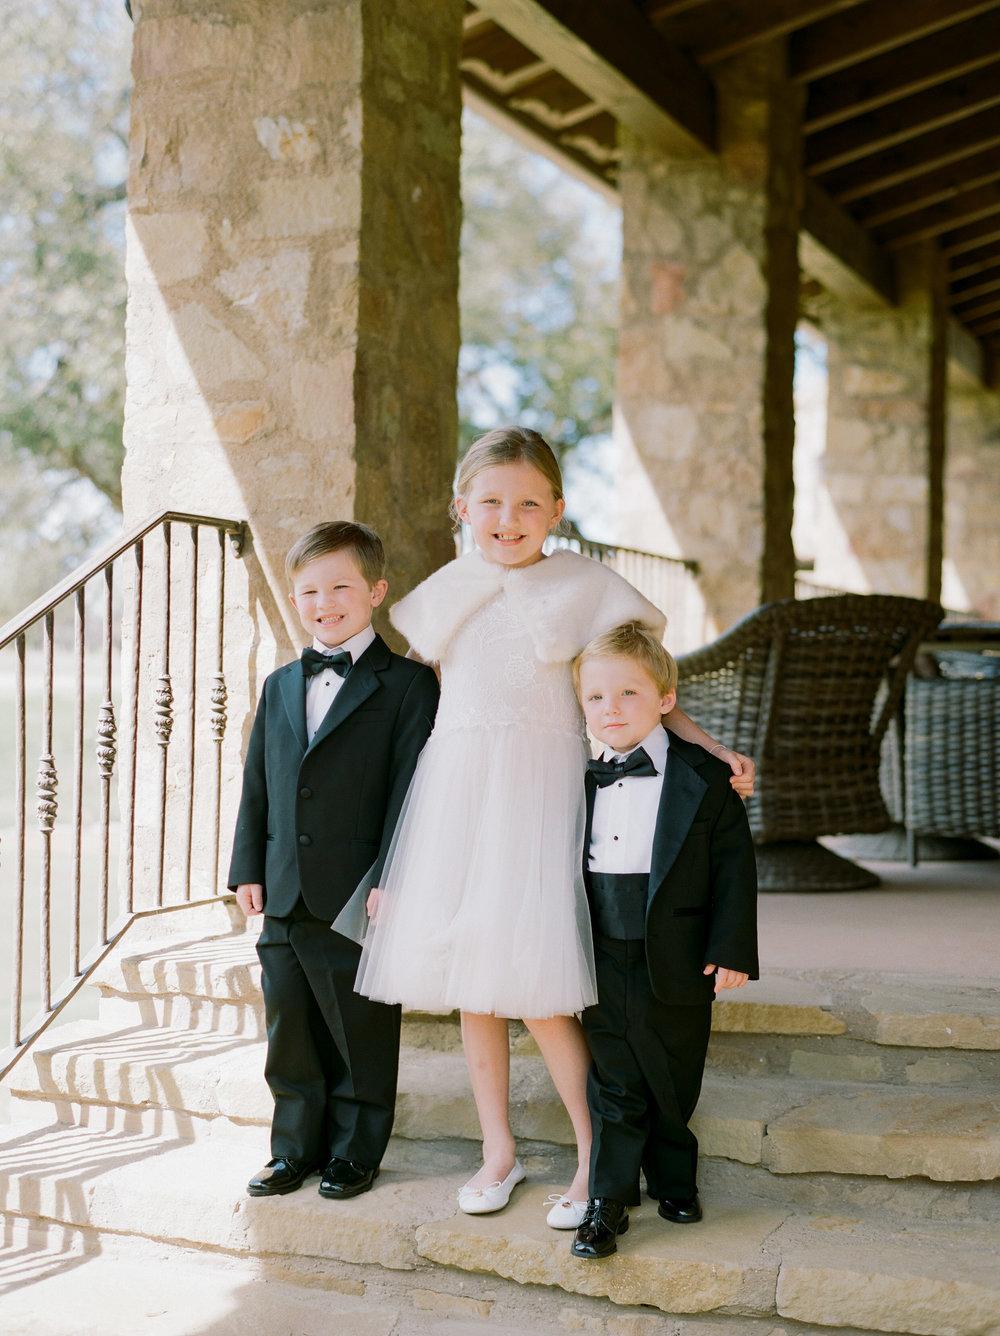 Escondido-Golf_Lake-Club-Hill-Country-Houston-Wedding-Photographer-Best-Top-Luxury-Destination-Engagements-Portrait-Austin-Photography-8.jpg